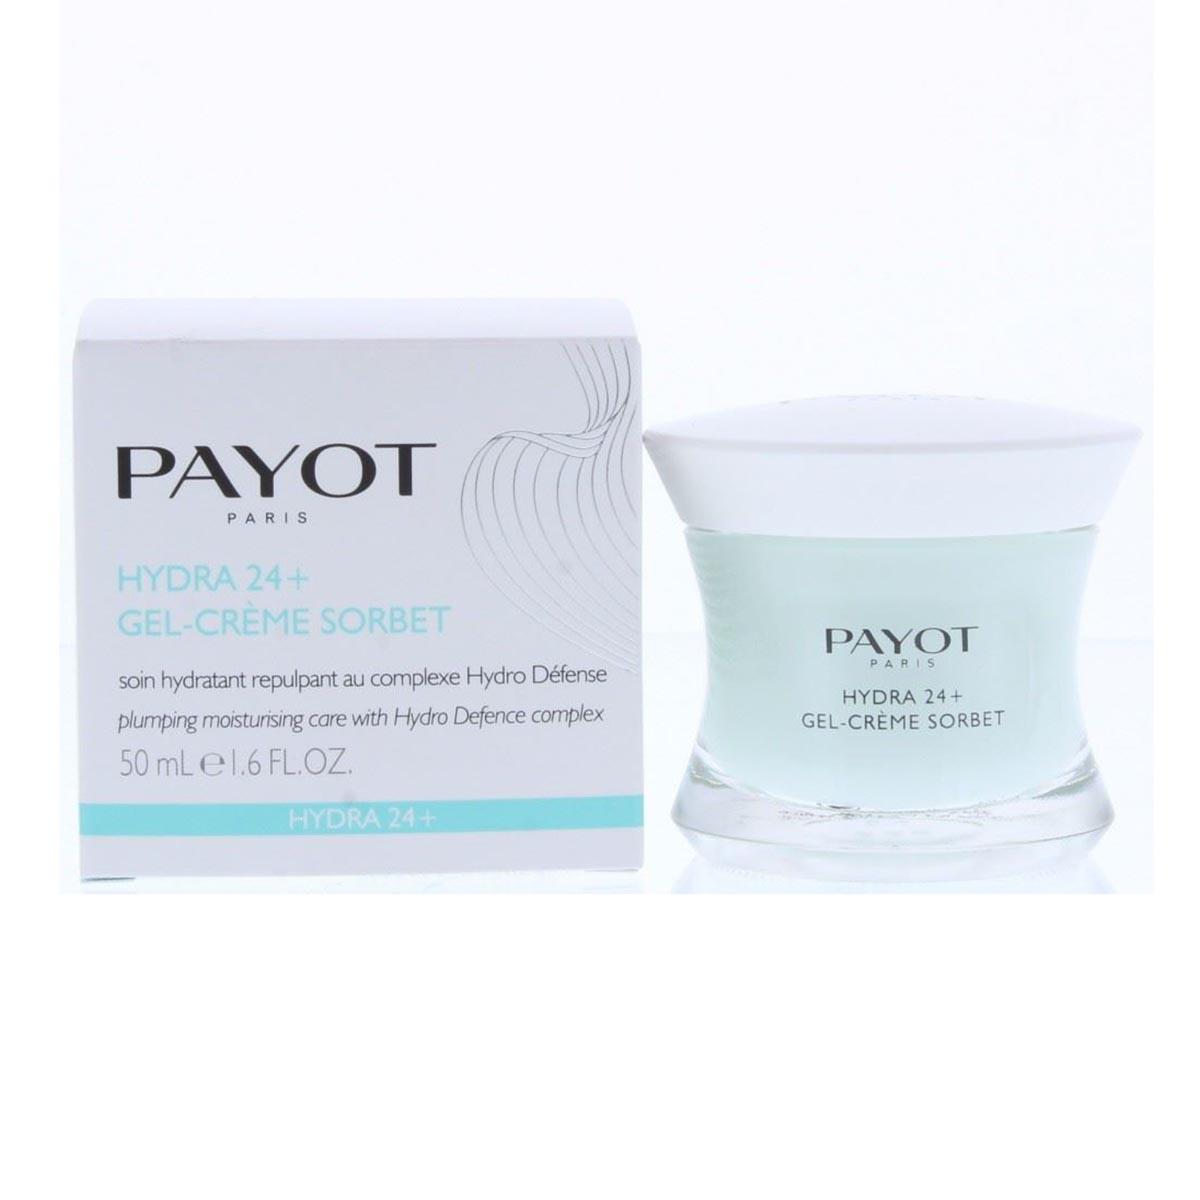 Payot hydra24 gel creme sorbet 50ml